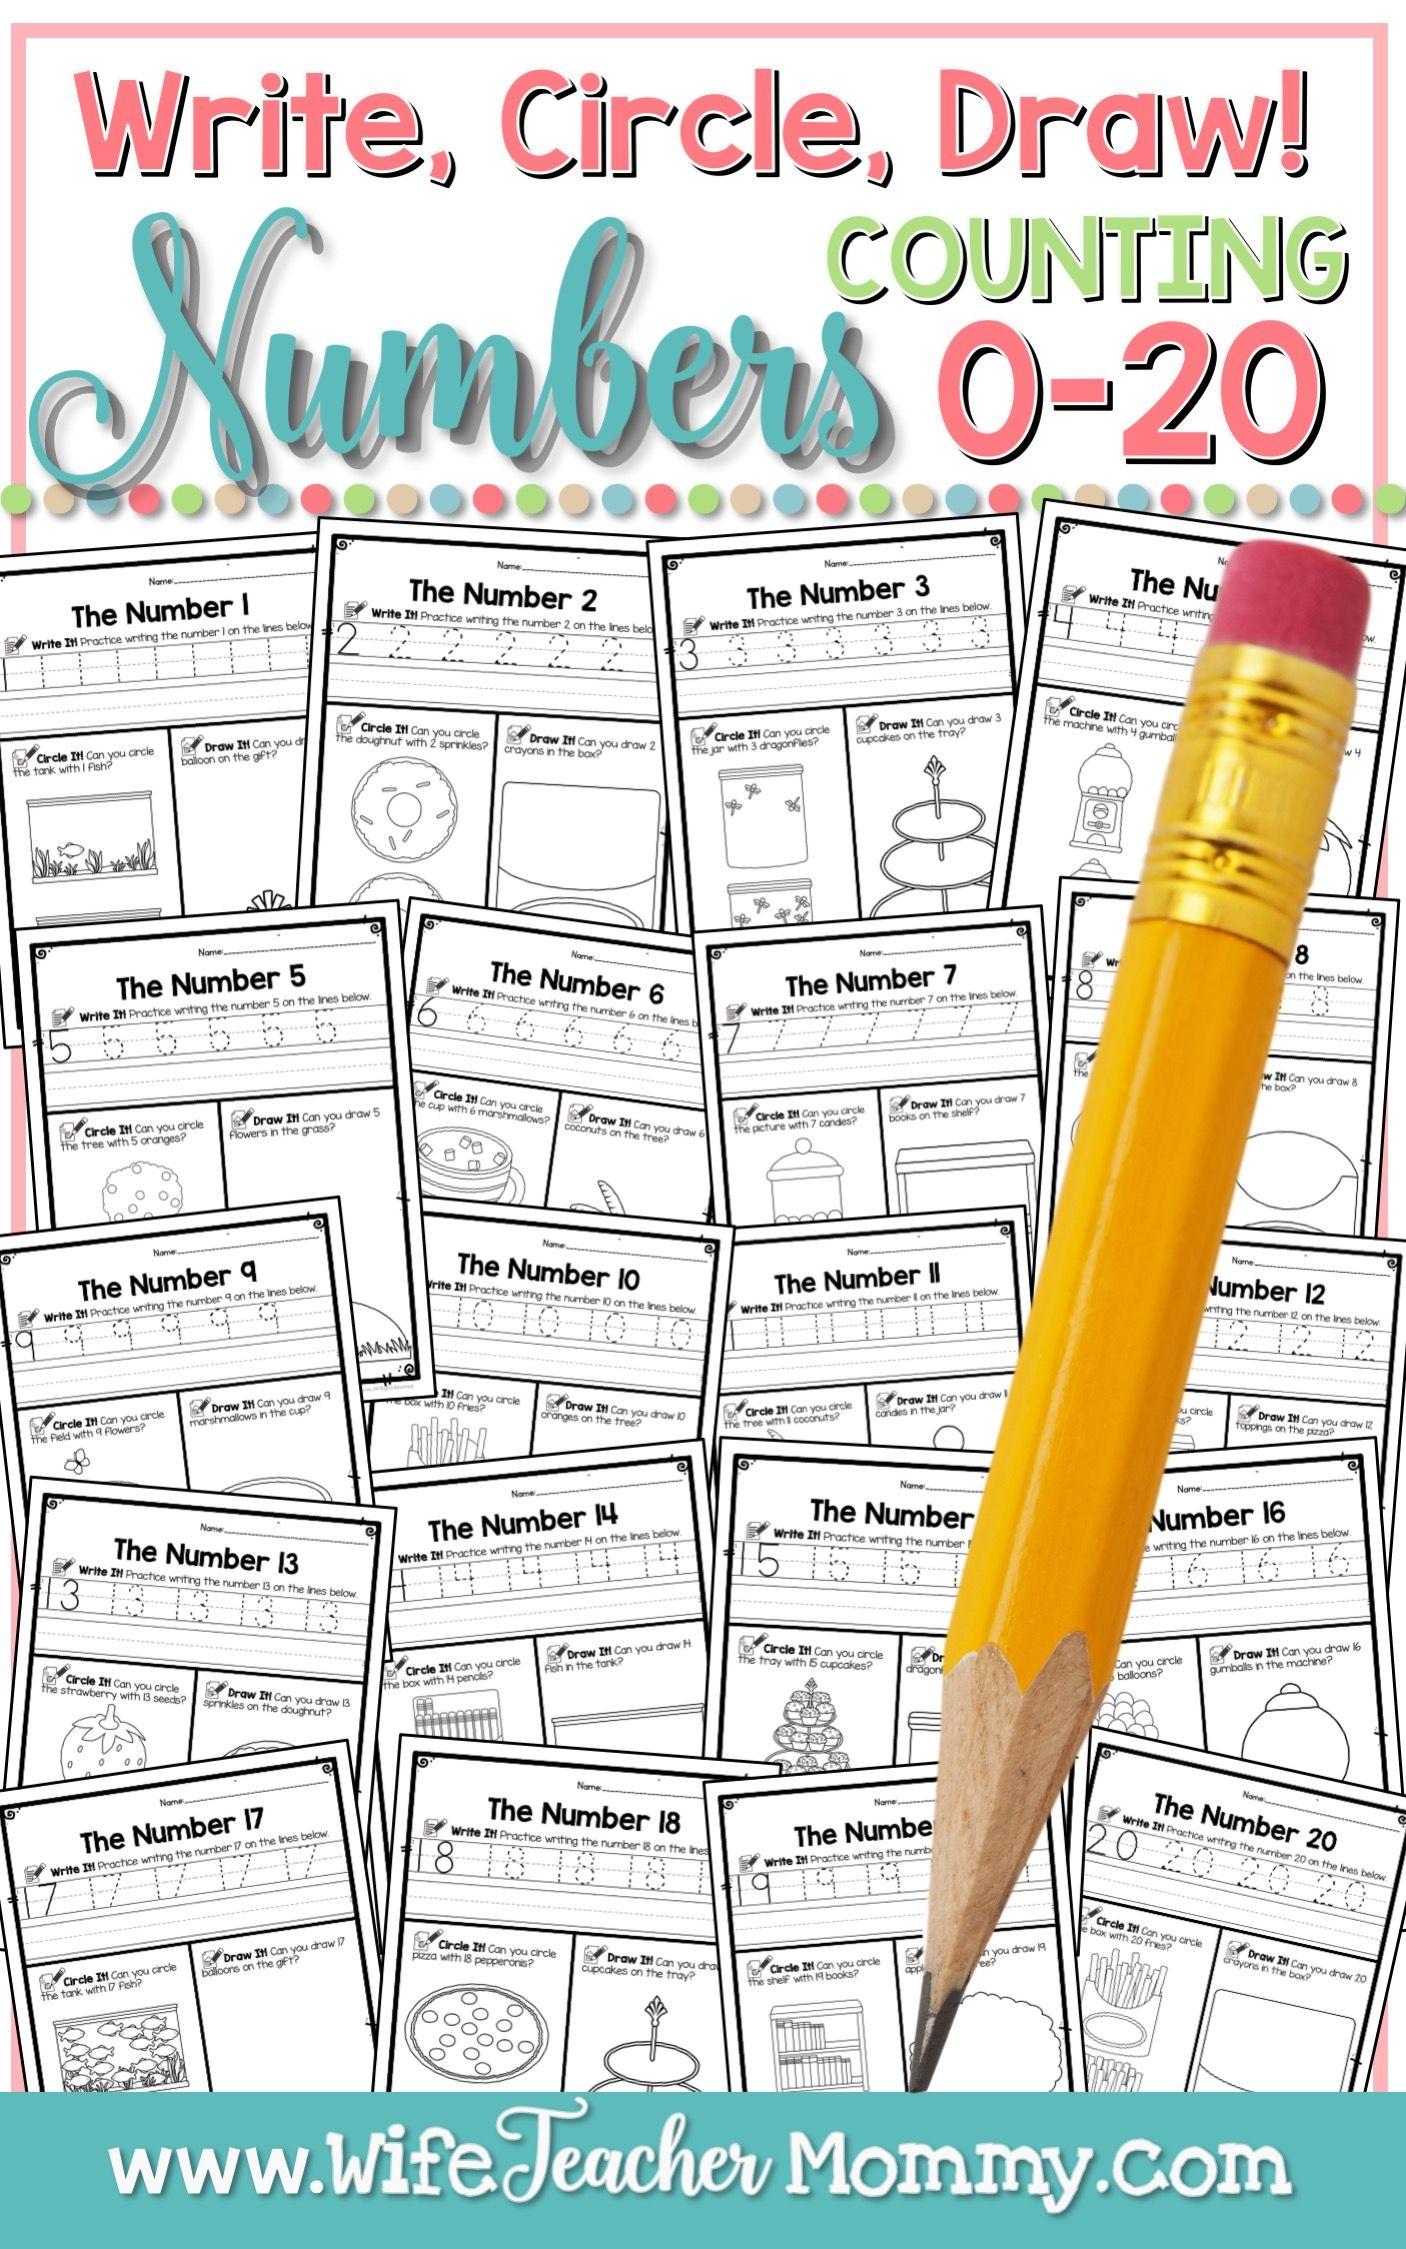 Number Worksheets 0 20 Counting Worksheets Write Circle